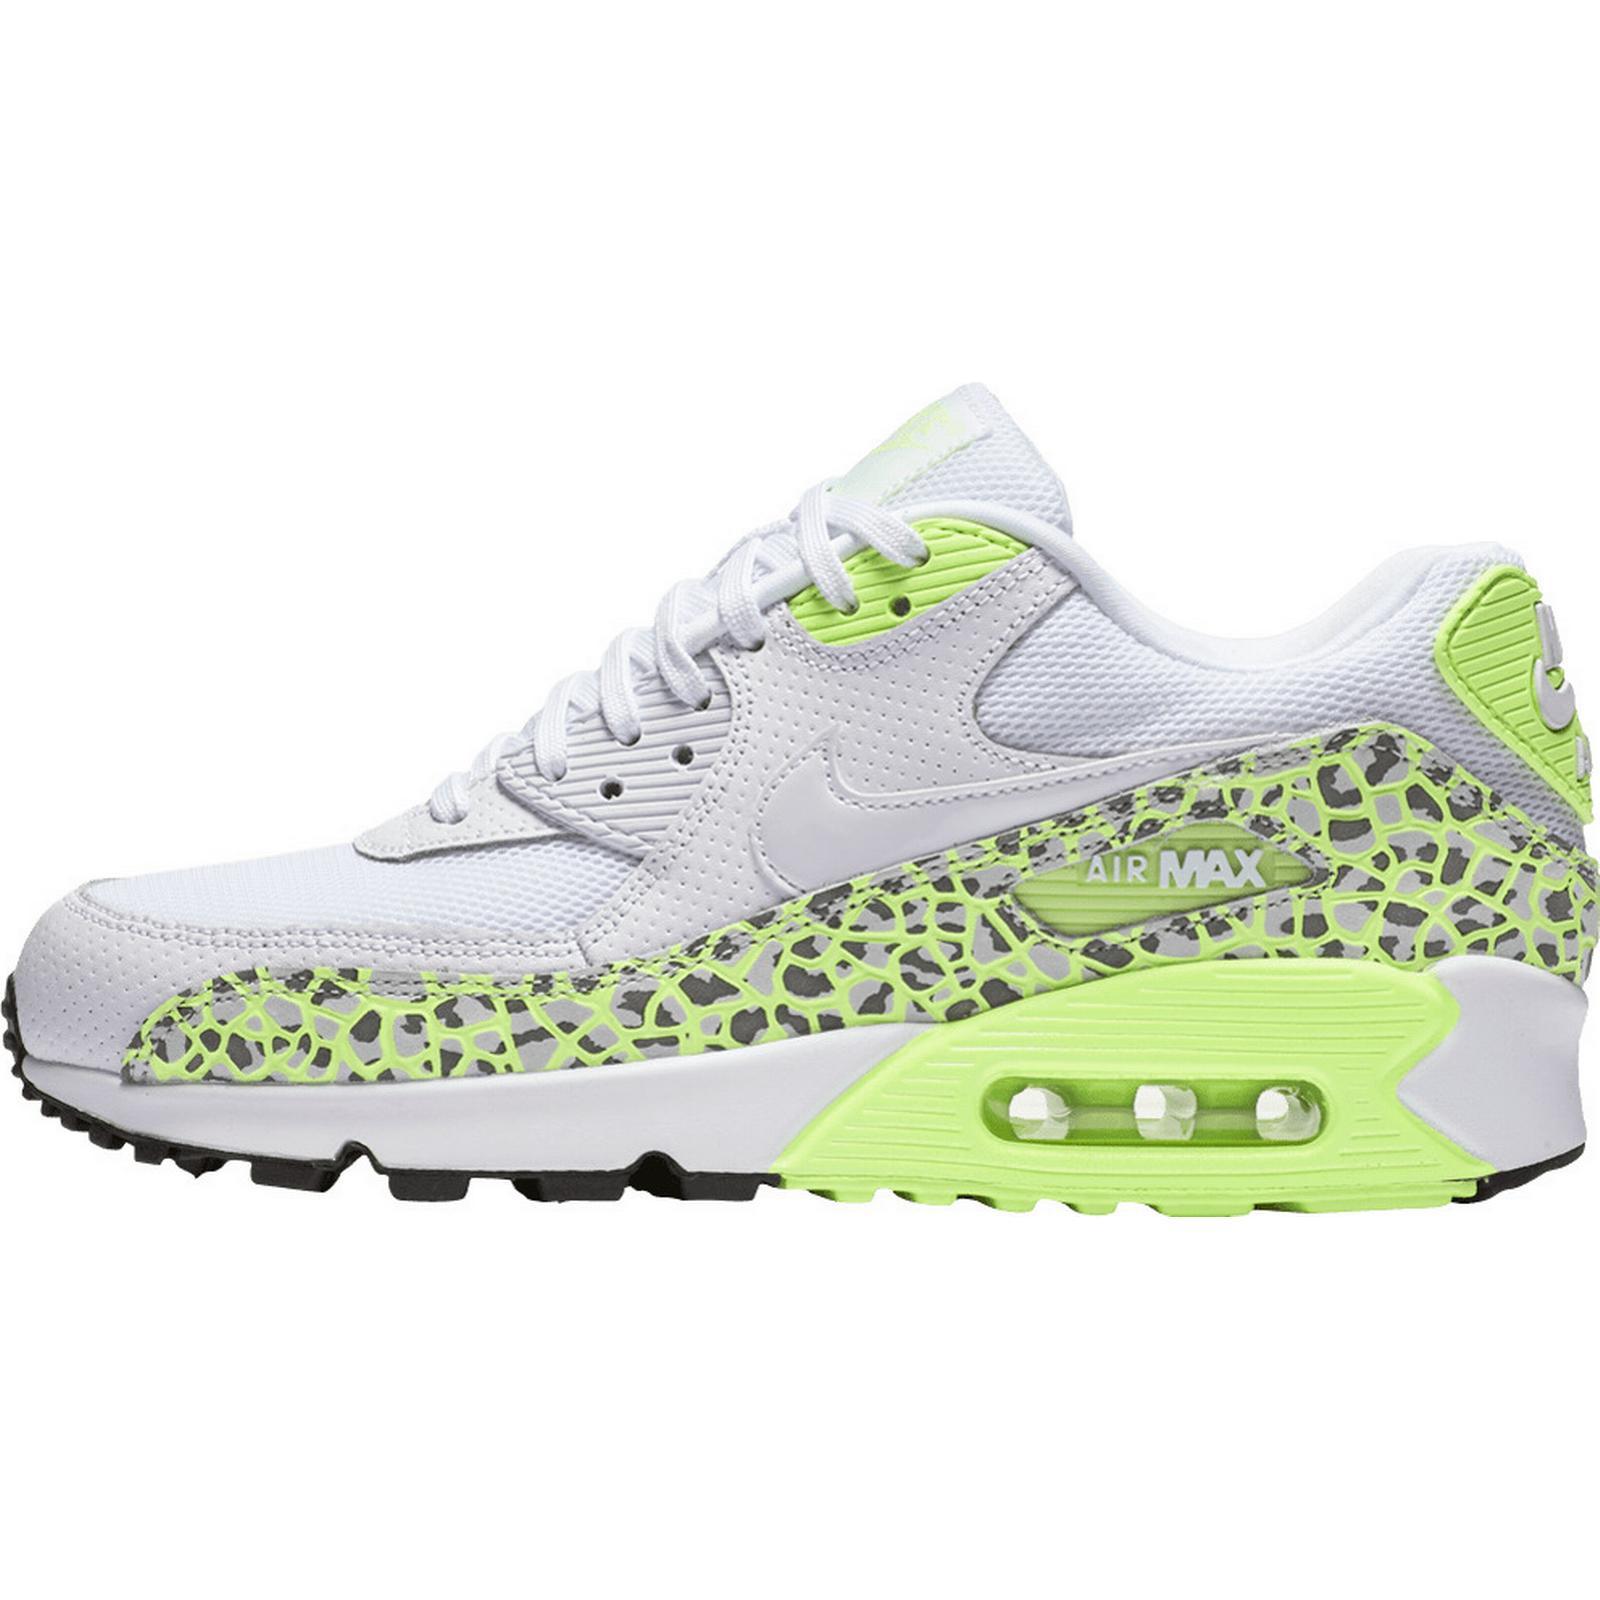 Nike Wmns Air Max 90 Wit Premium - Wit 90 719729